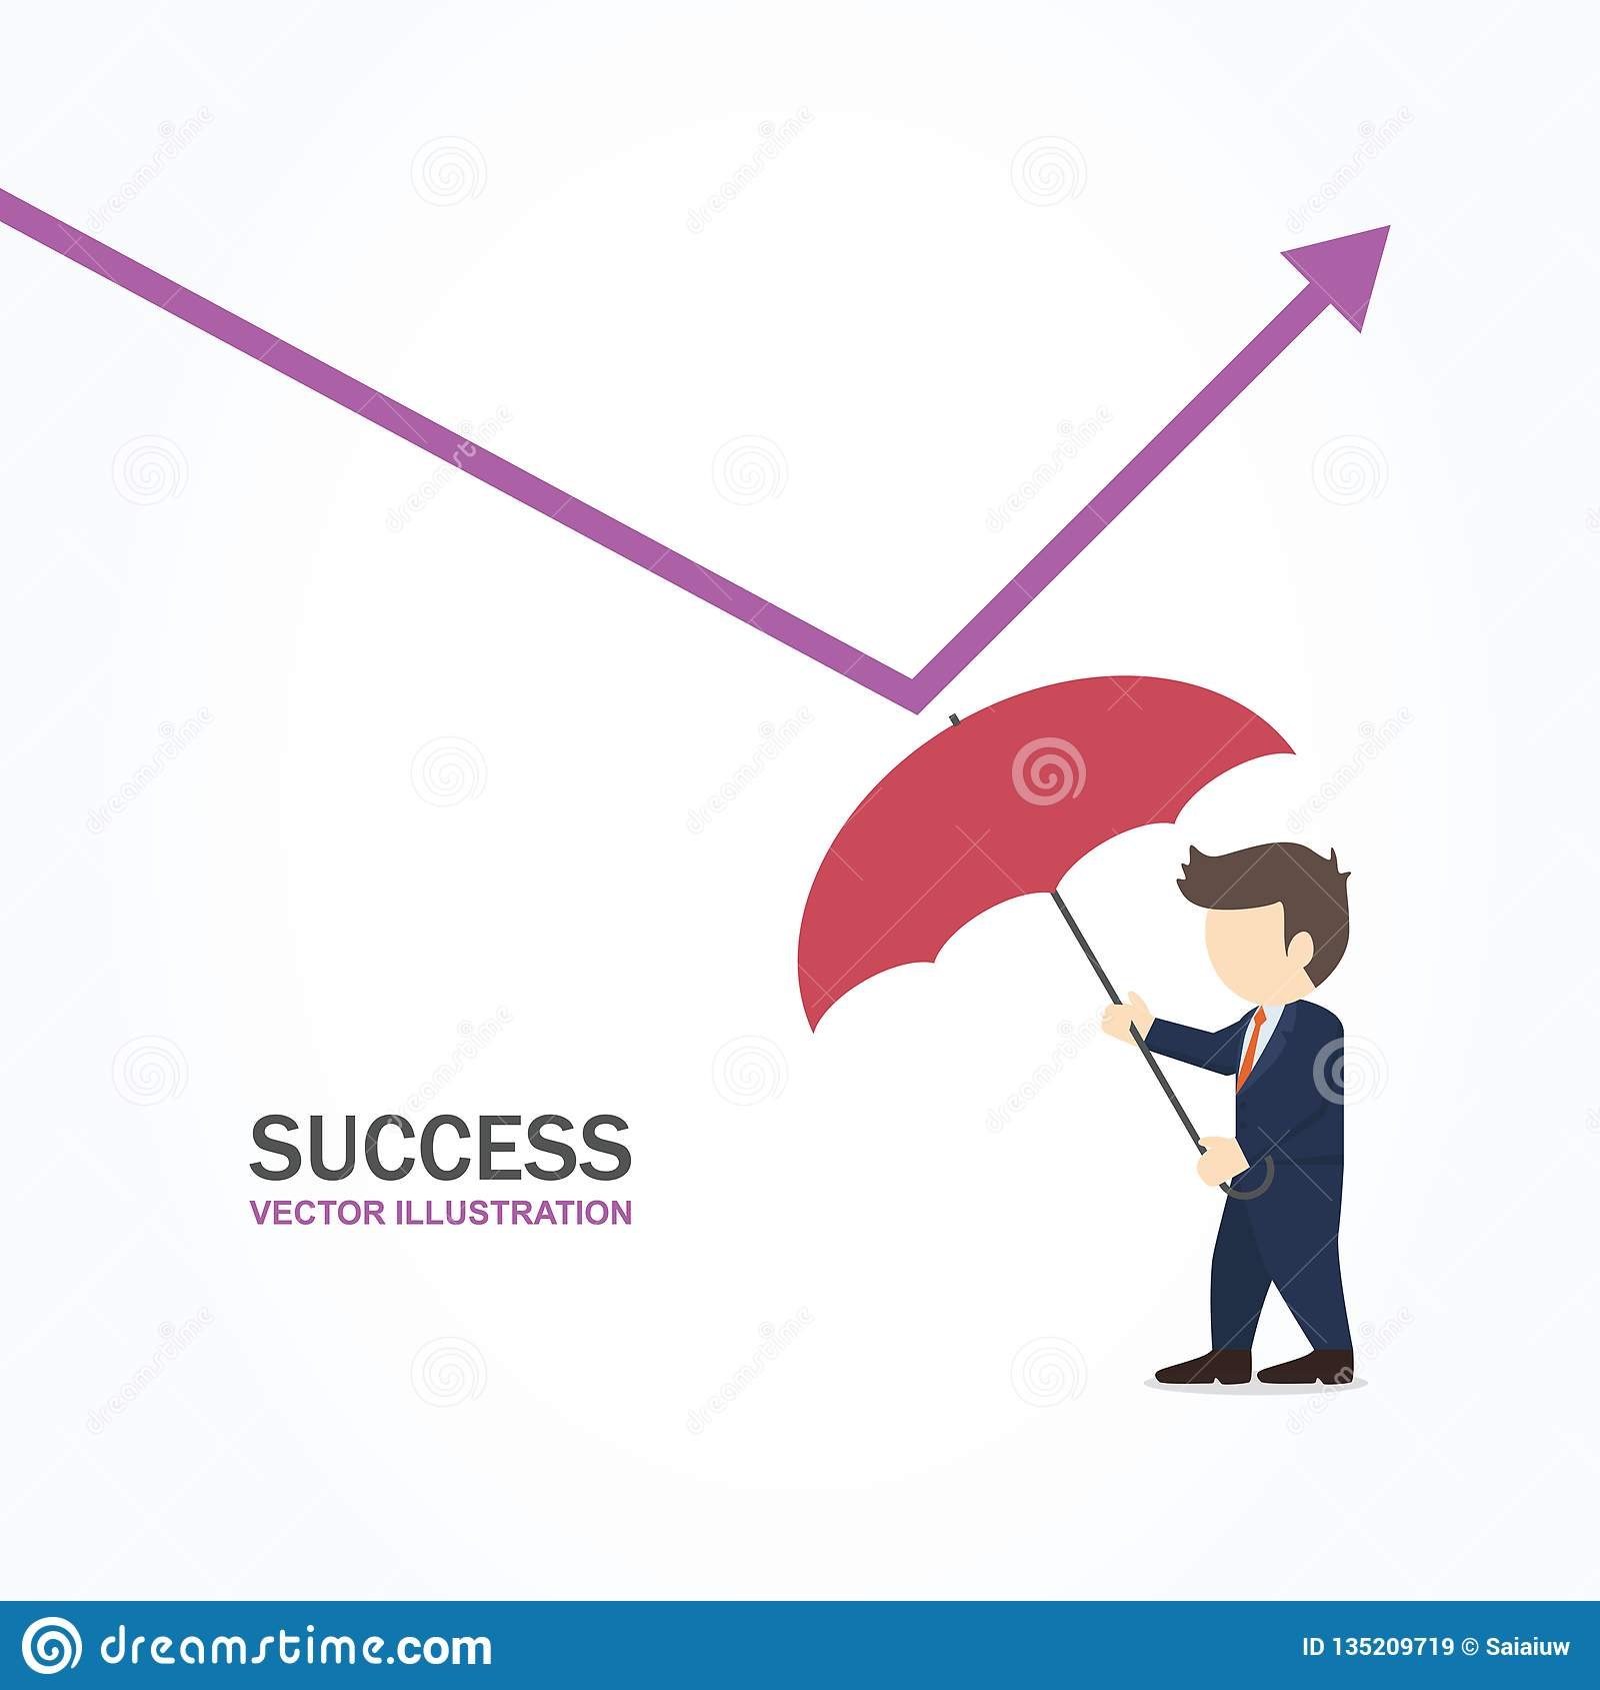 Businessman using umbrella to reflect low graph. Success concept.